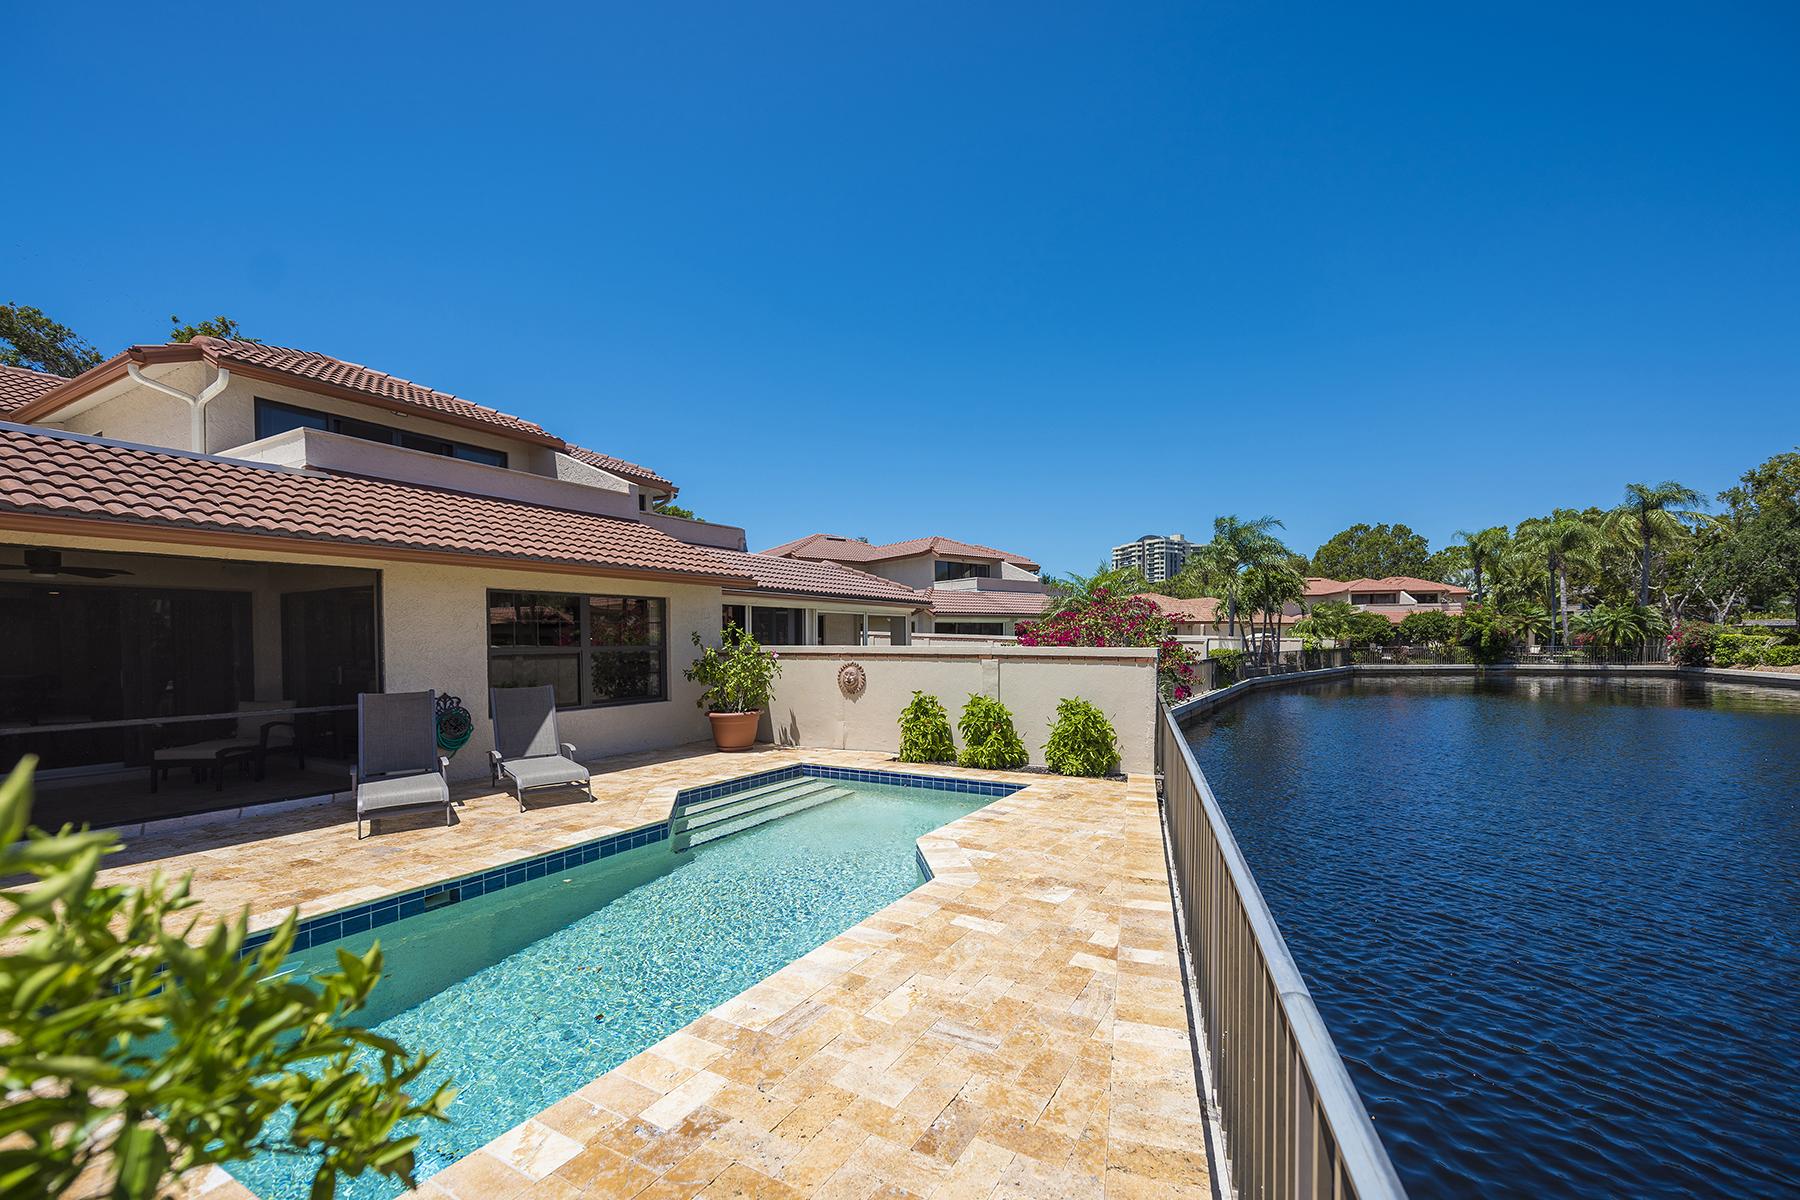 Single Family Home for Sale at PELICAN BAY - LUGANO 5908 Via Lugano, Naples, Florida 34108 United States